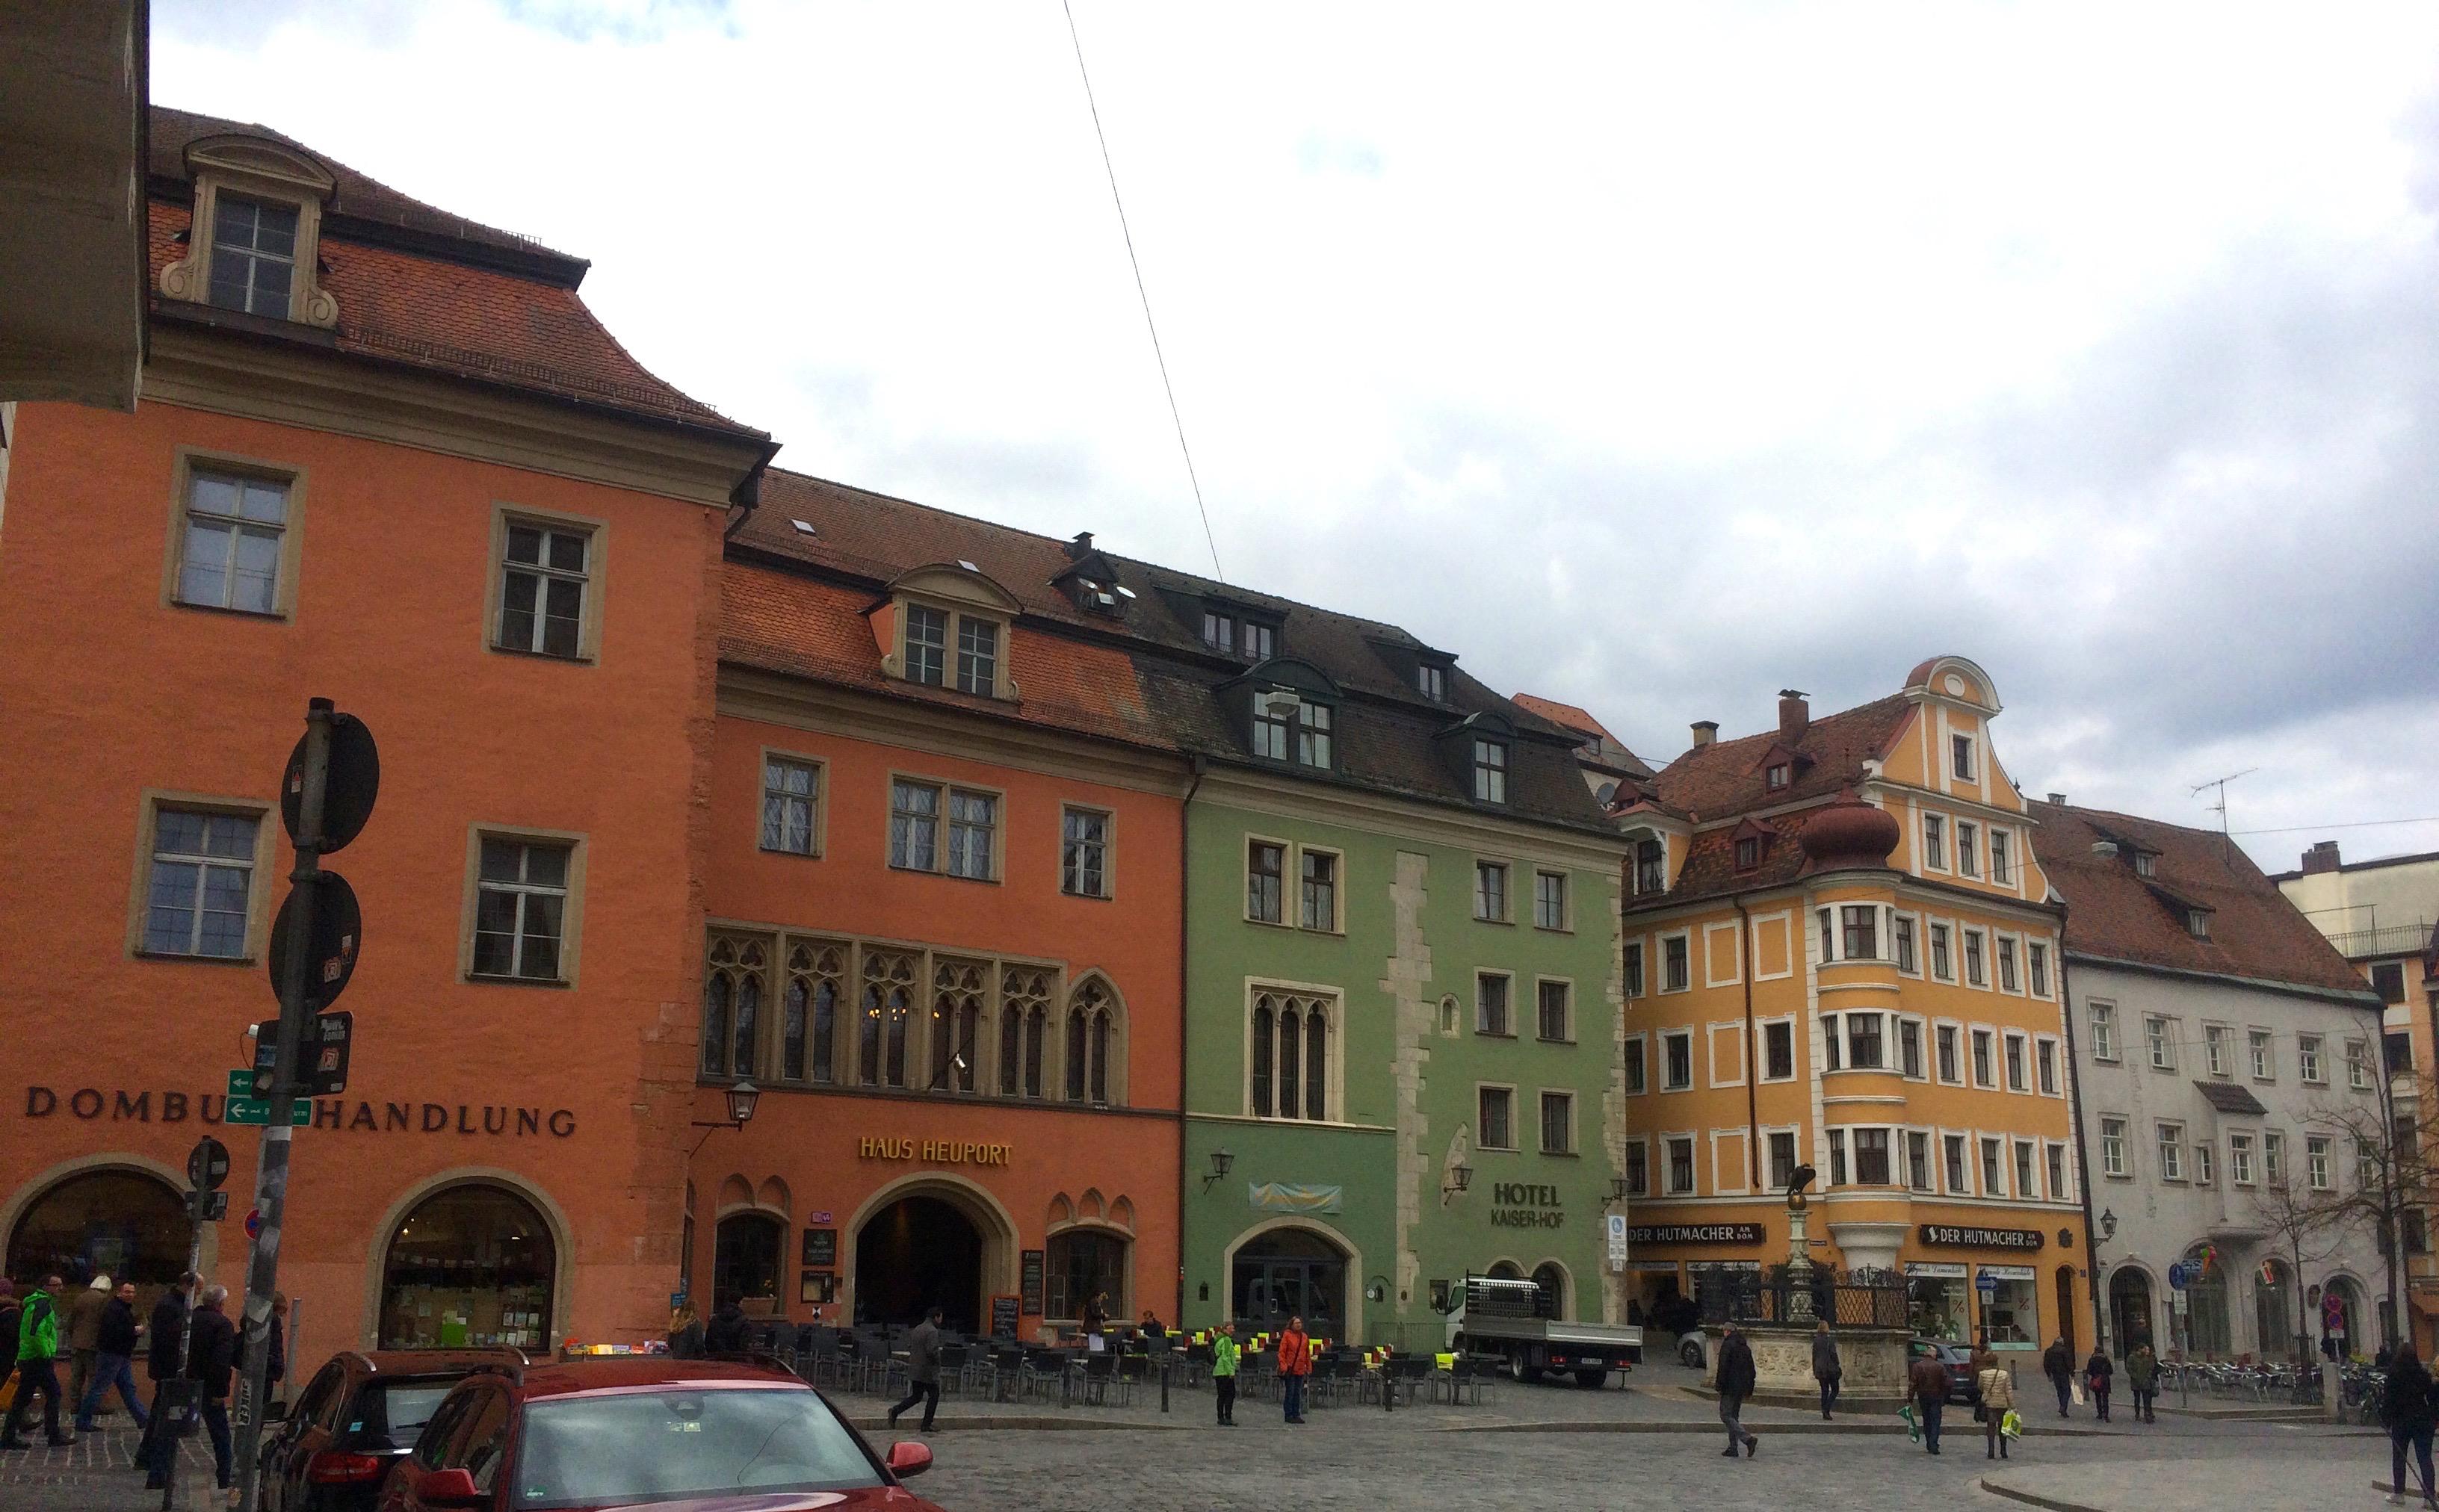 Regensburg 3